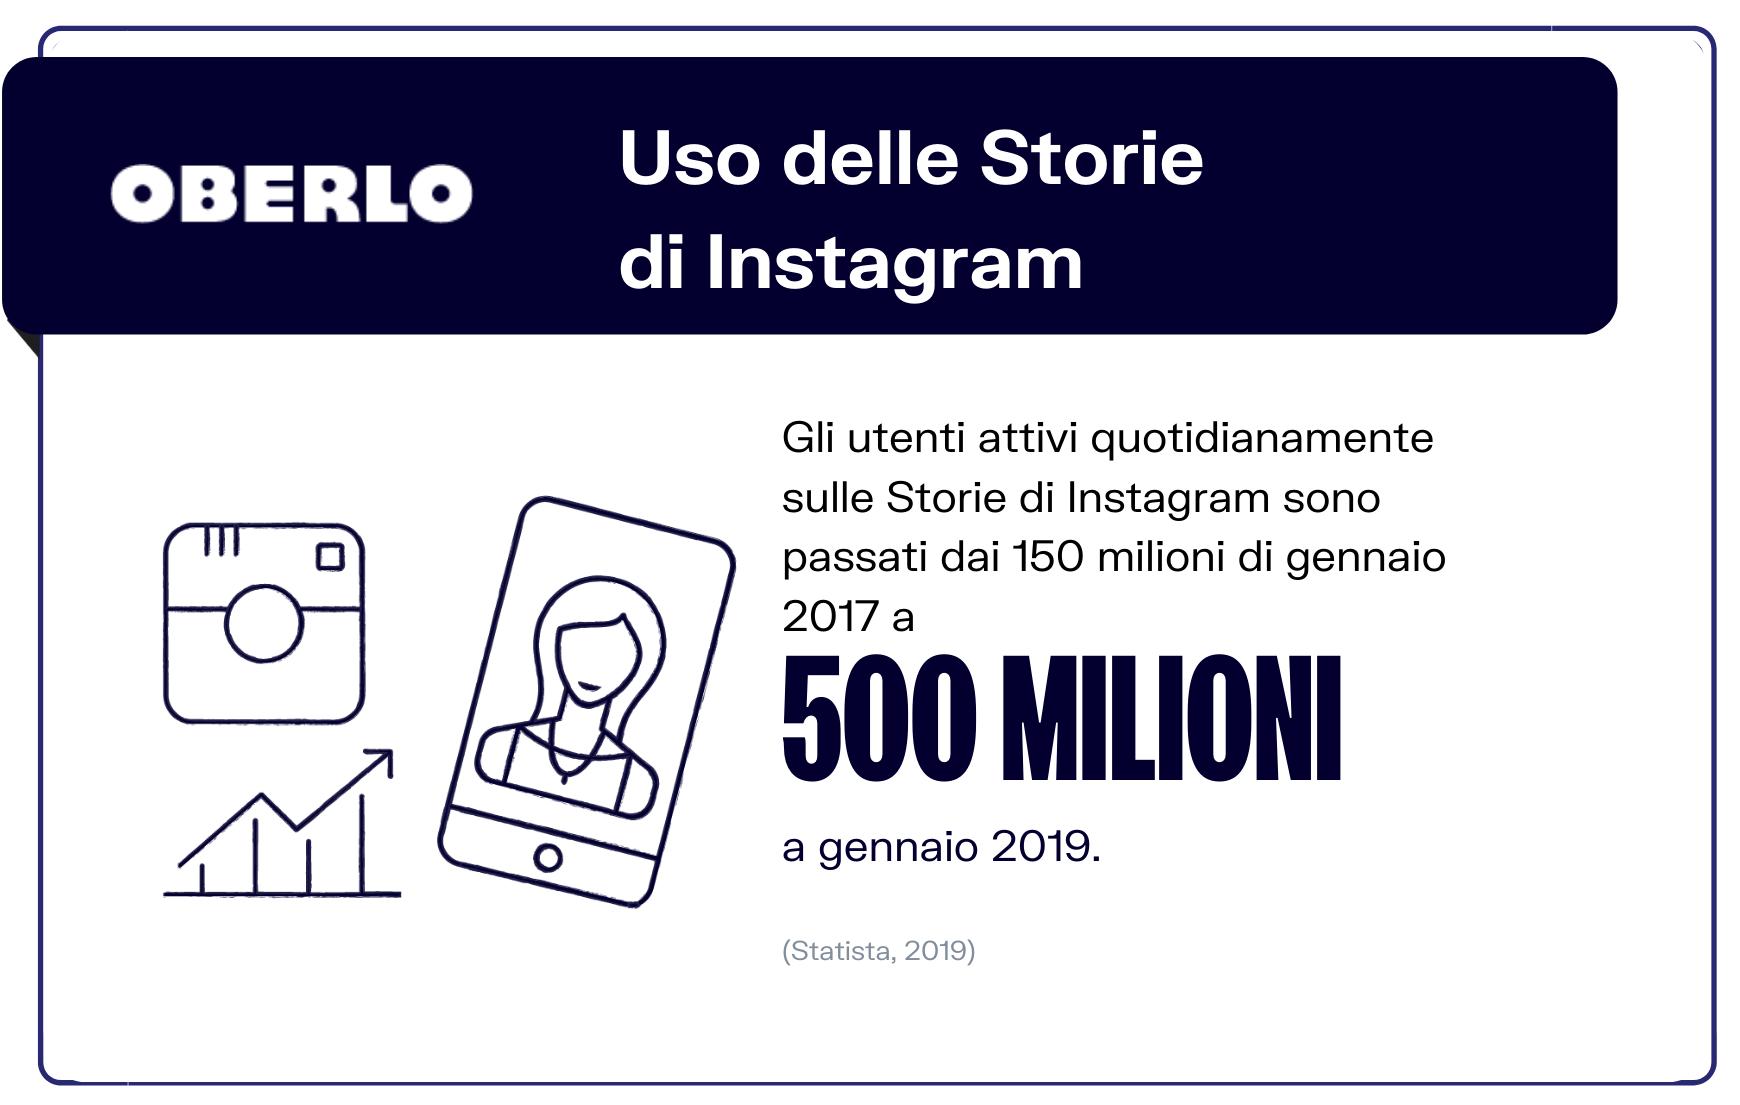 statistiche social media storie instagram